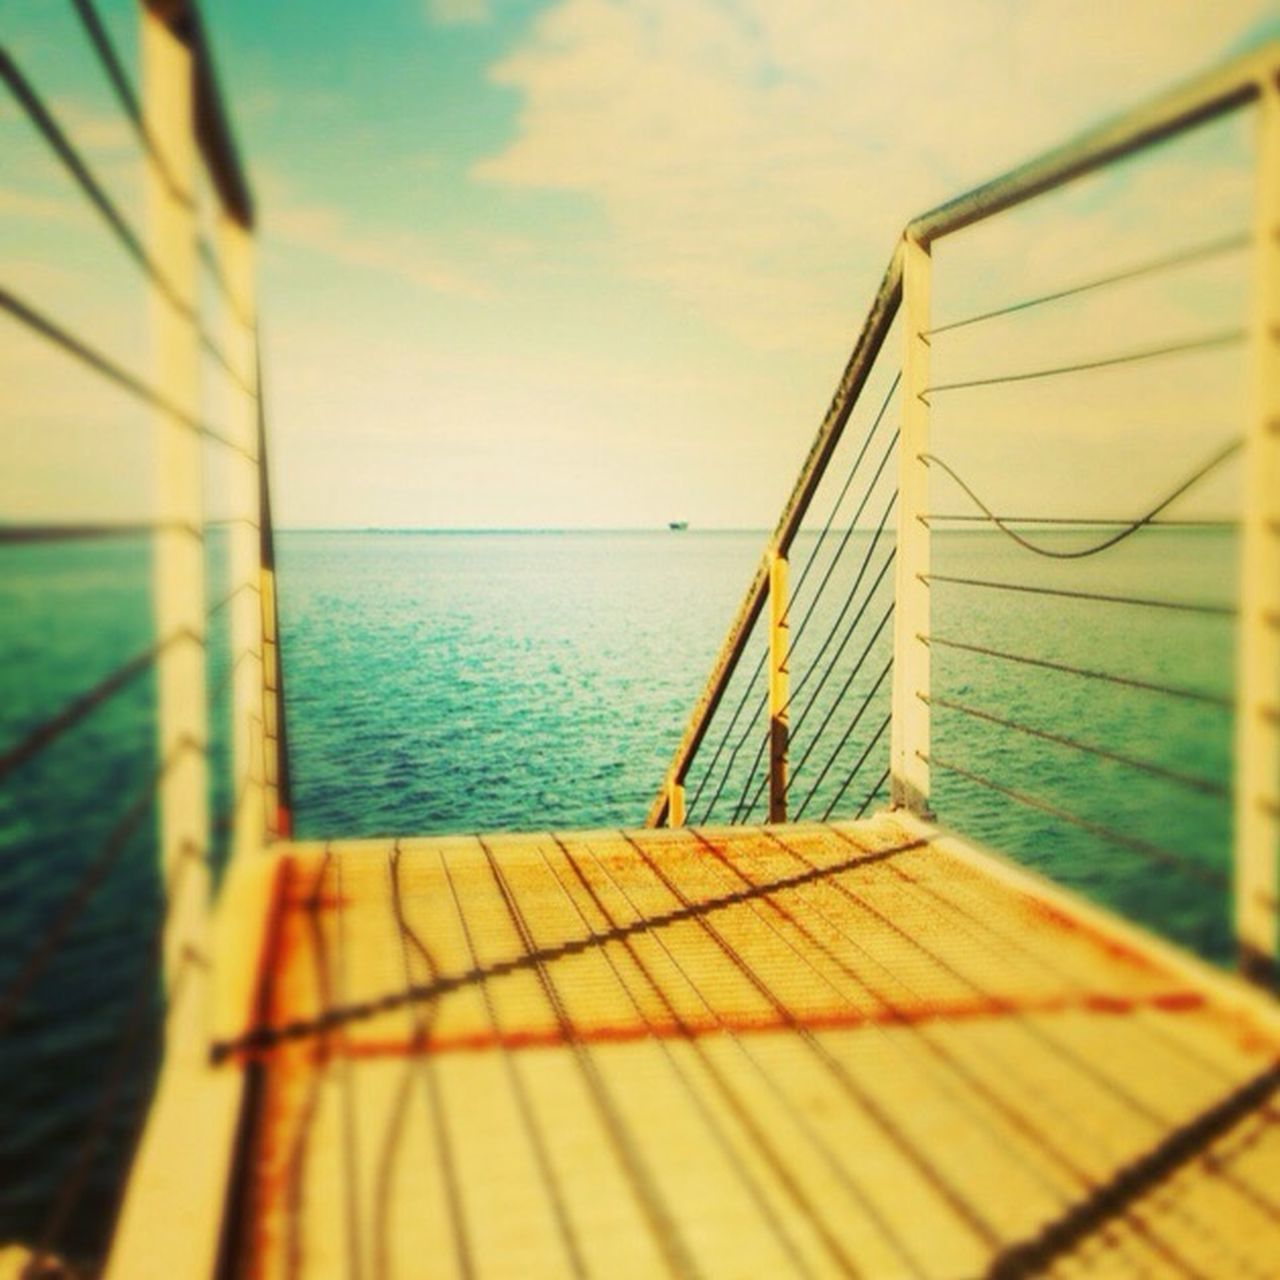 Choice. Uptoyou Trieste Sittingwaitingwishing My Favorite Place Barcola Water Seaitloveit